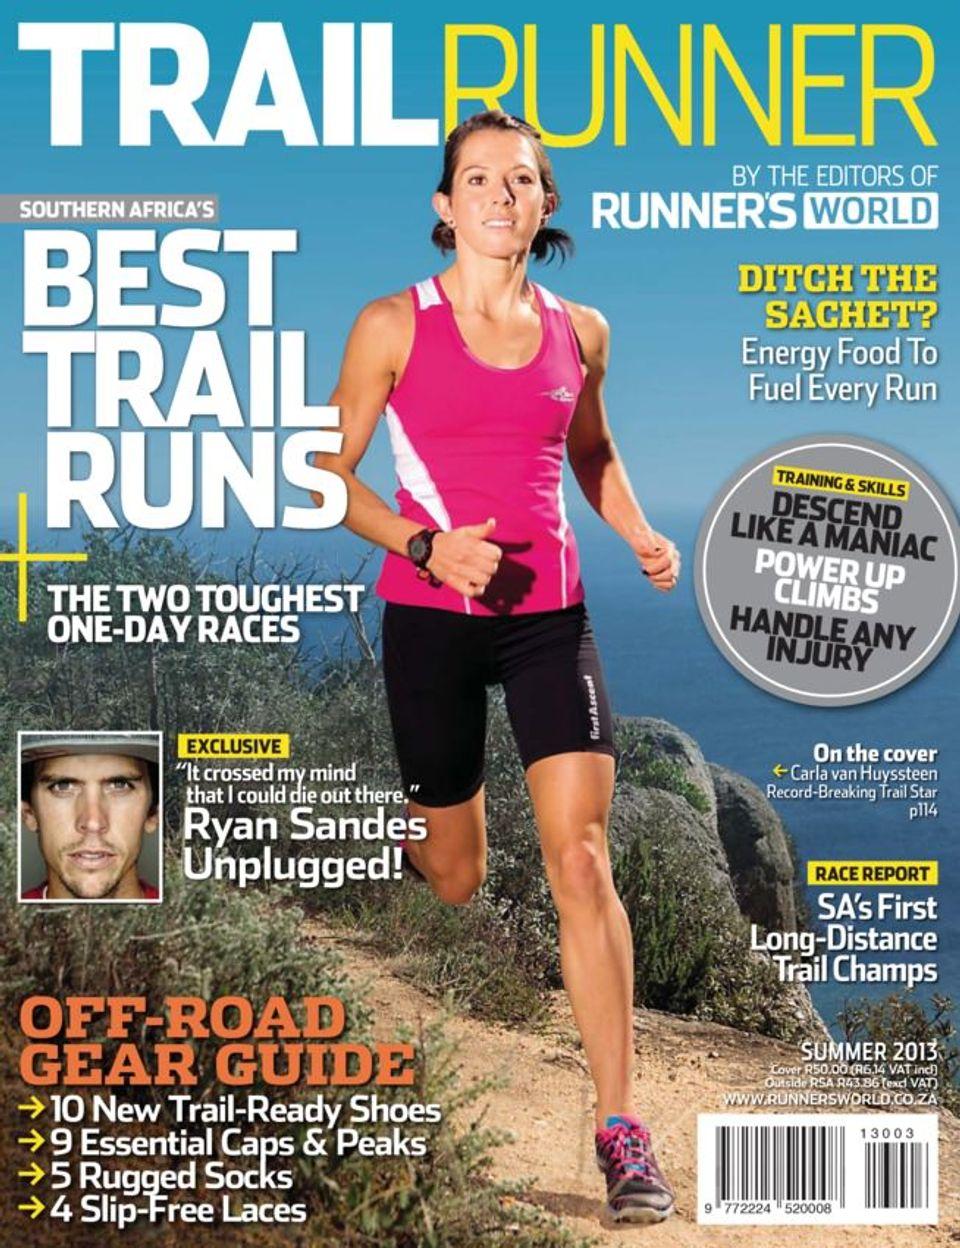 TRAIL RUNNER(From the makers of Runner